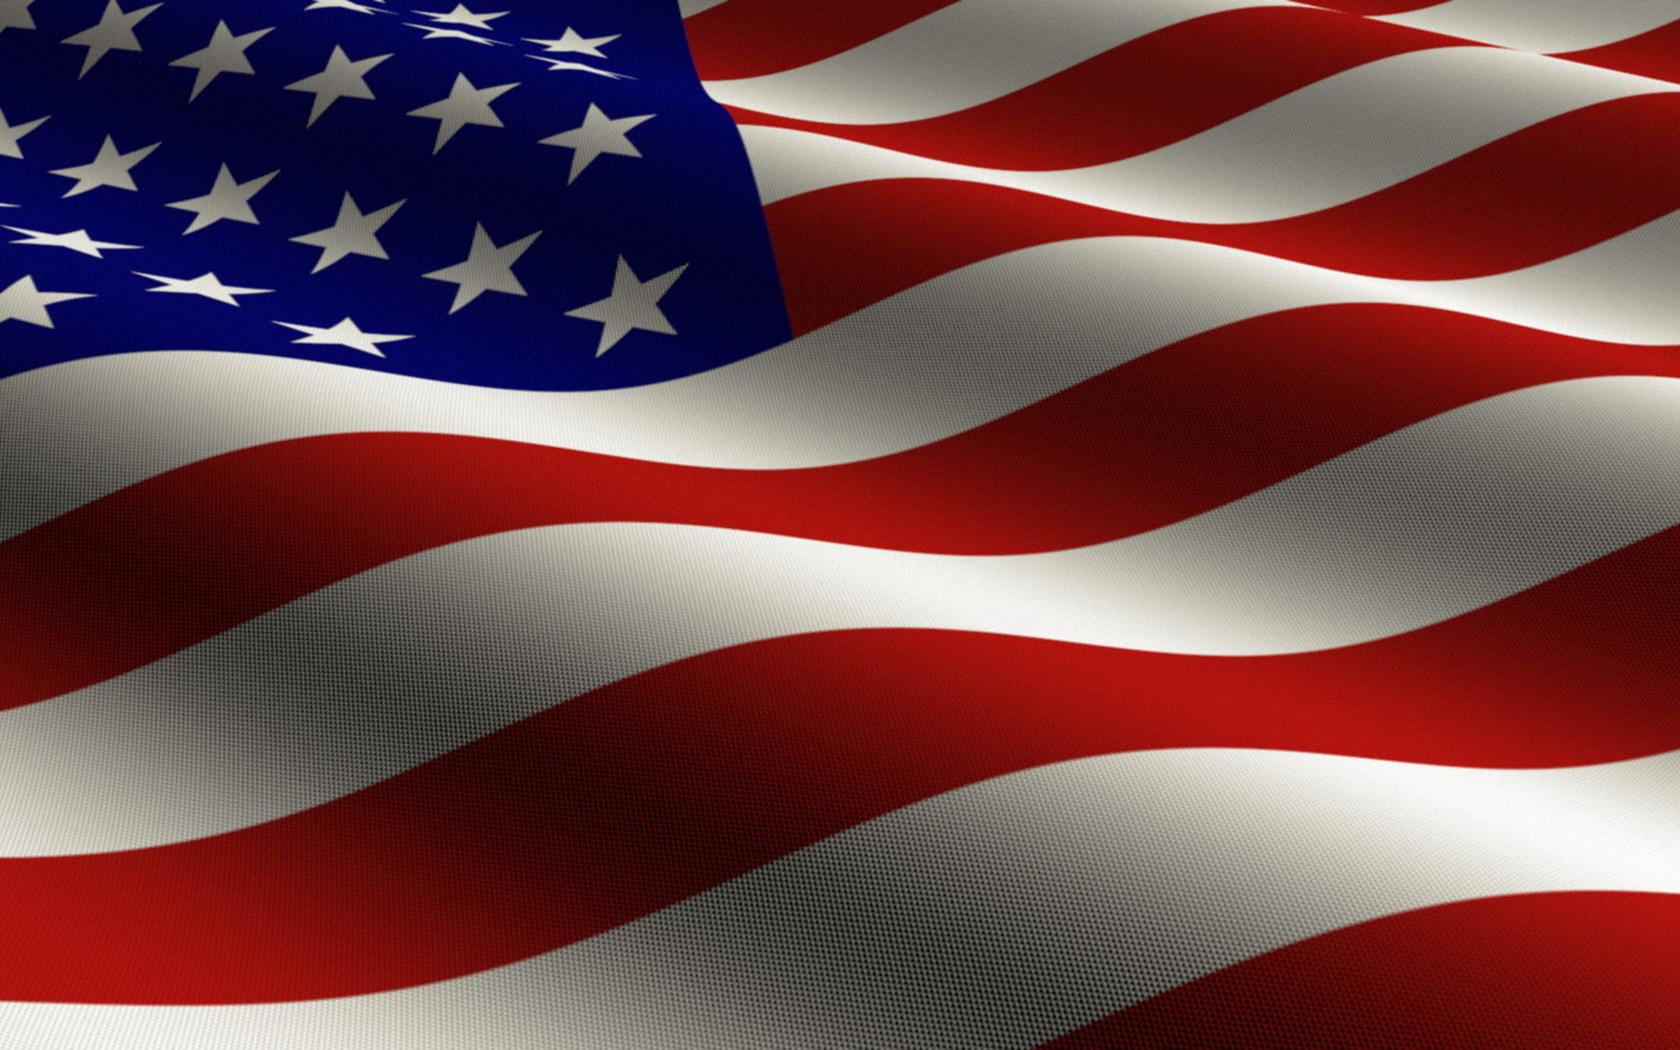 USA American Flag wallpaper background 1680x1050